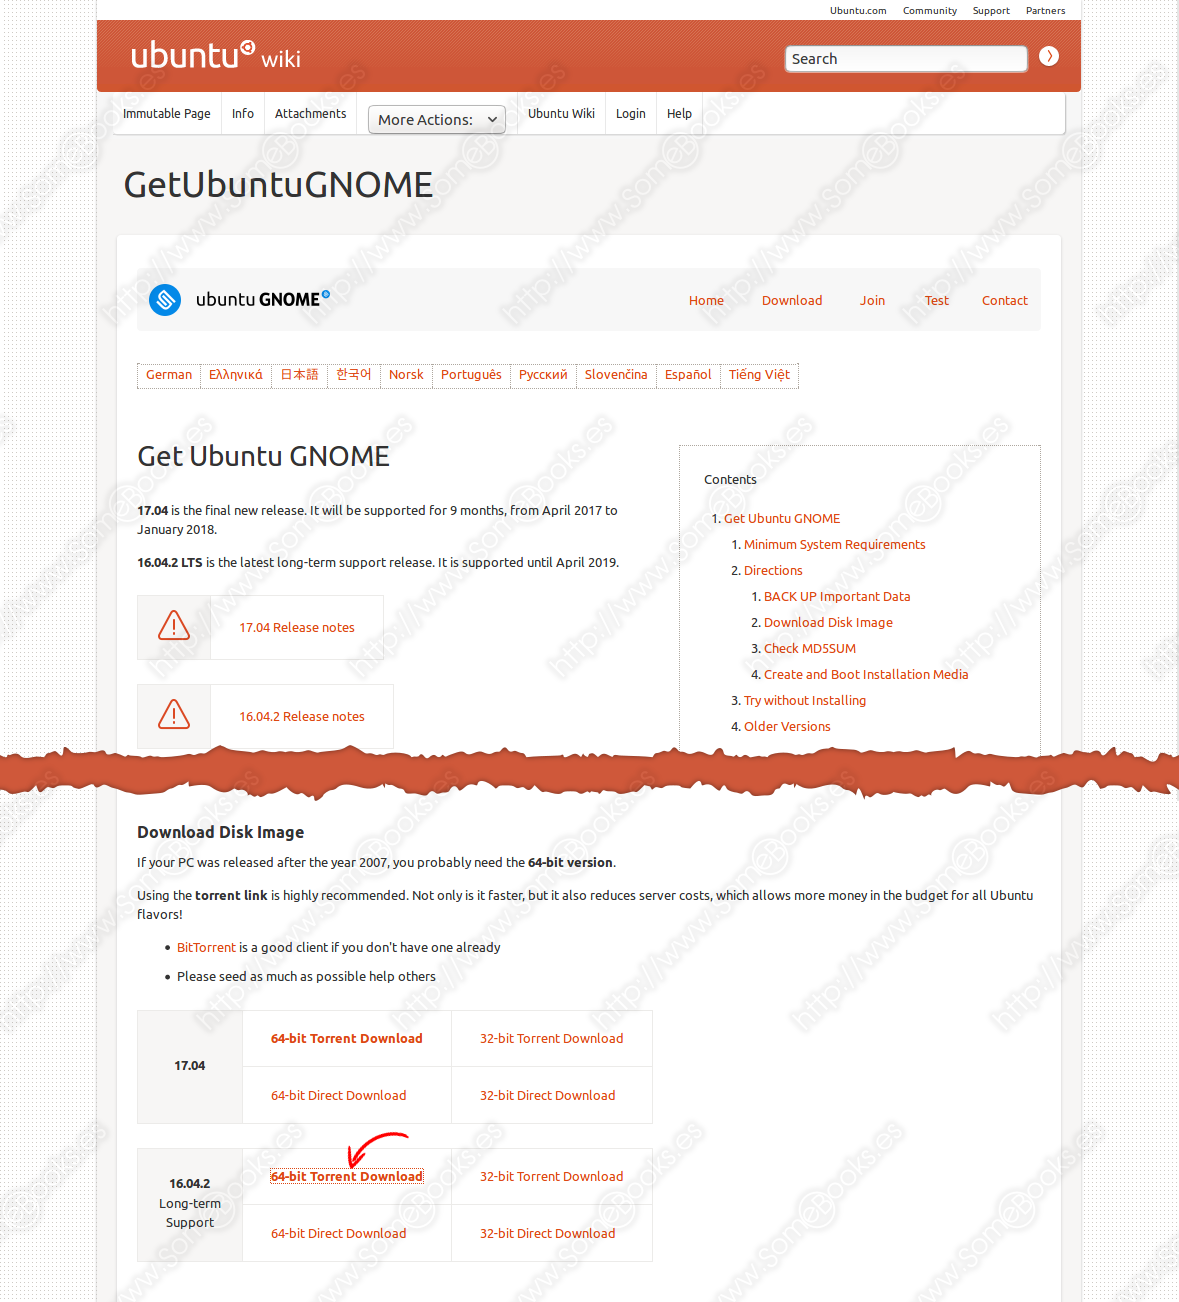 Instalar-Ubuntu-GNOME-16.04.2-LTS-desde-cero-001